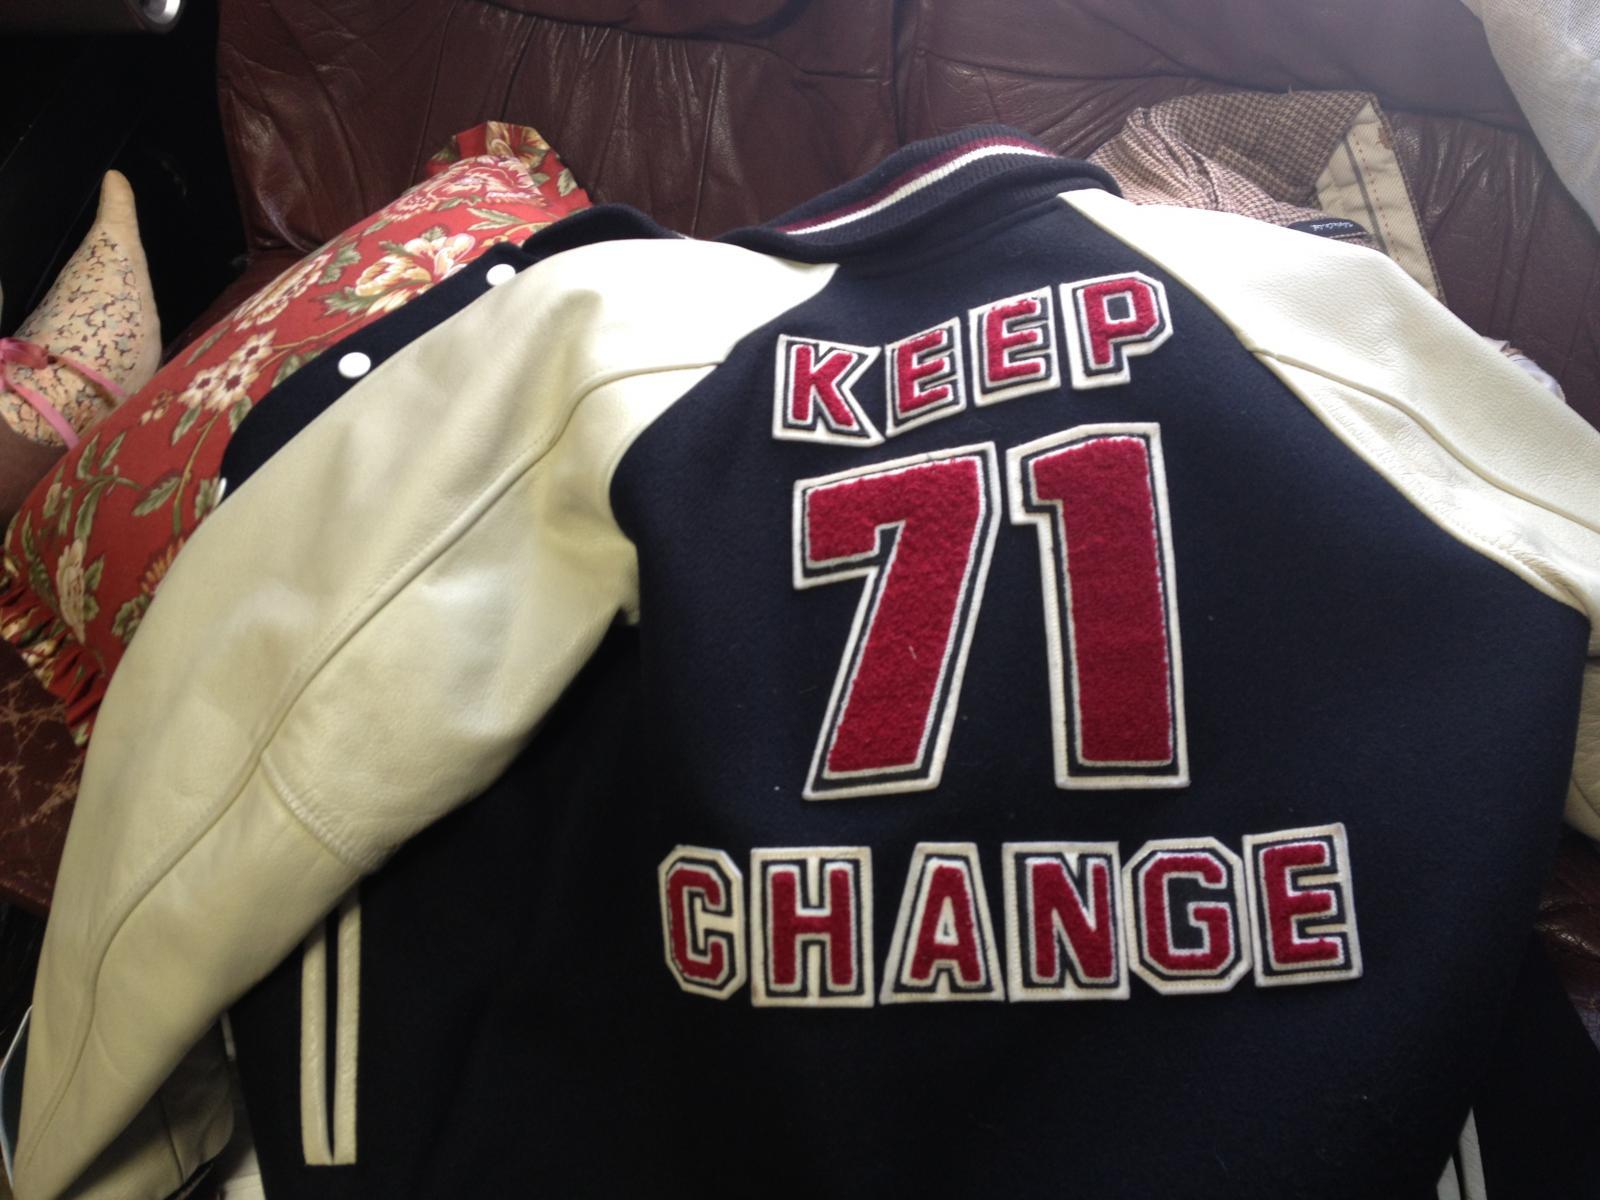 Keep Change 71